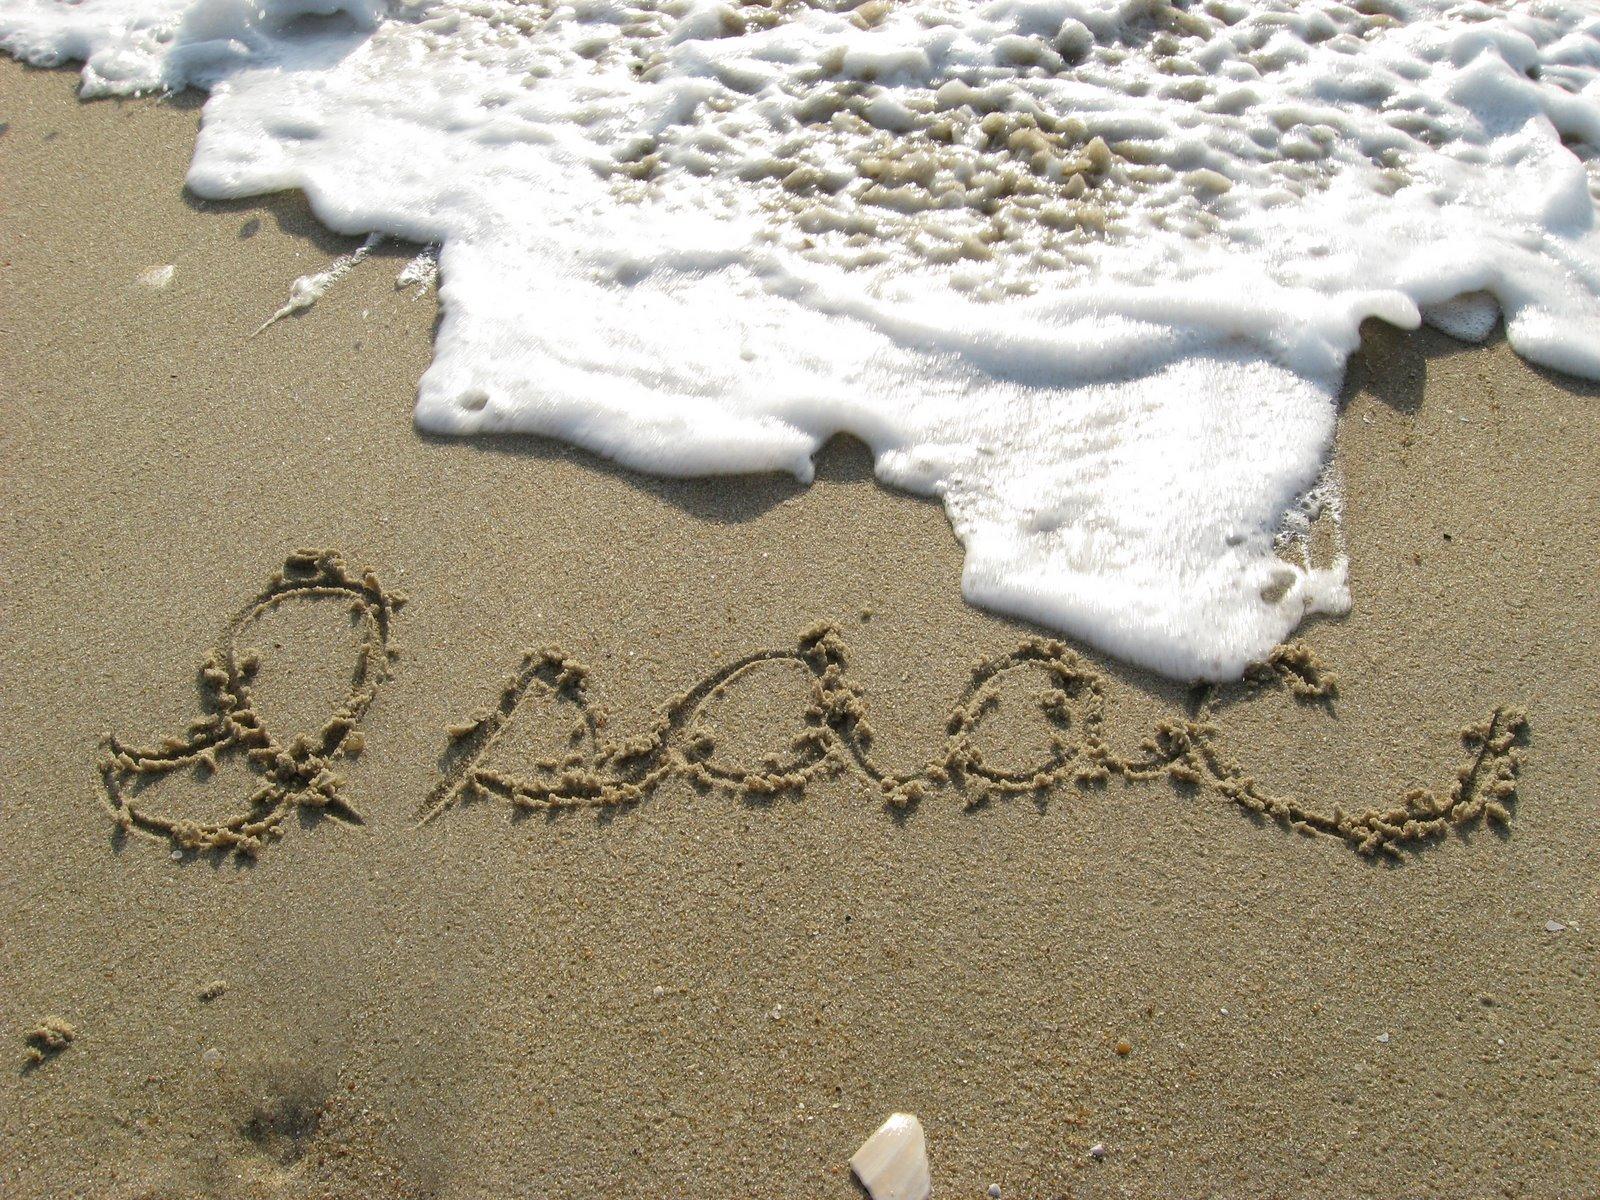 [Bethany+Beach+08+067.jpg]